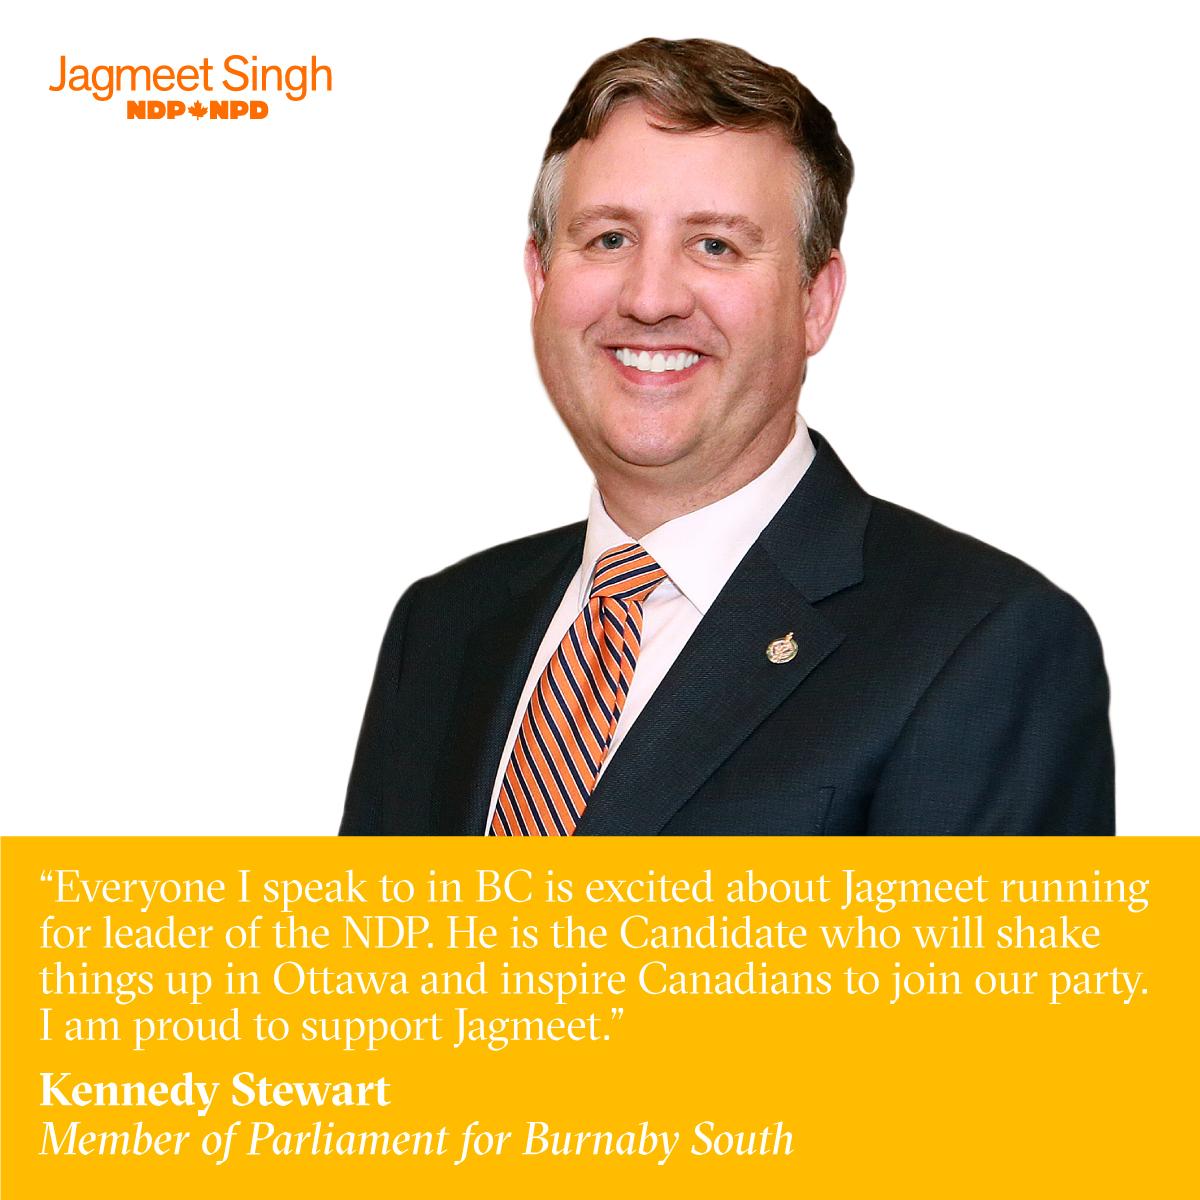 jagmeet-singh_2017_endorsement_kennedy-steward_english.jpg